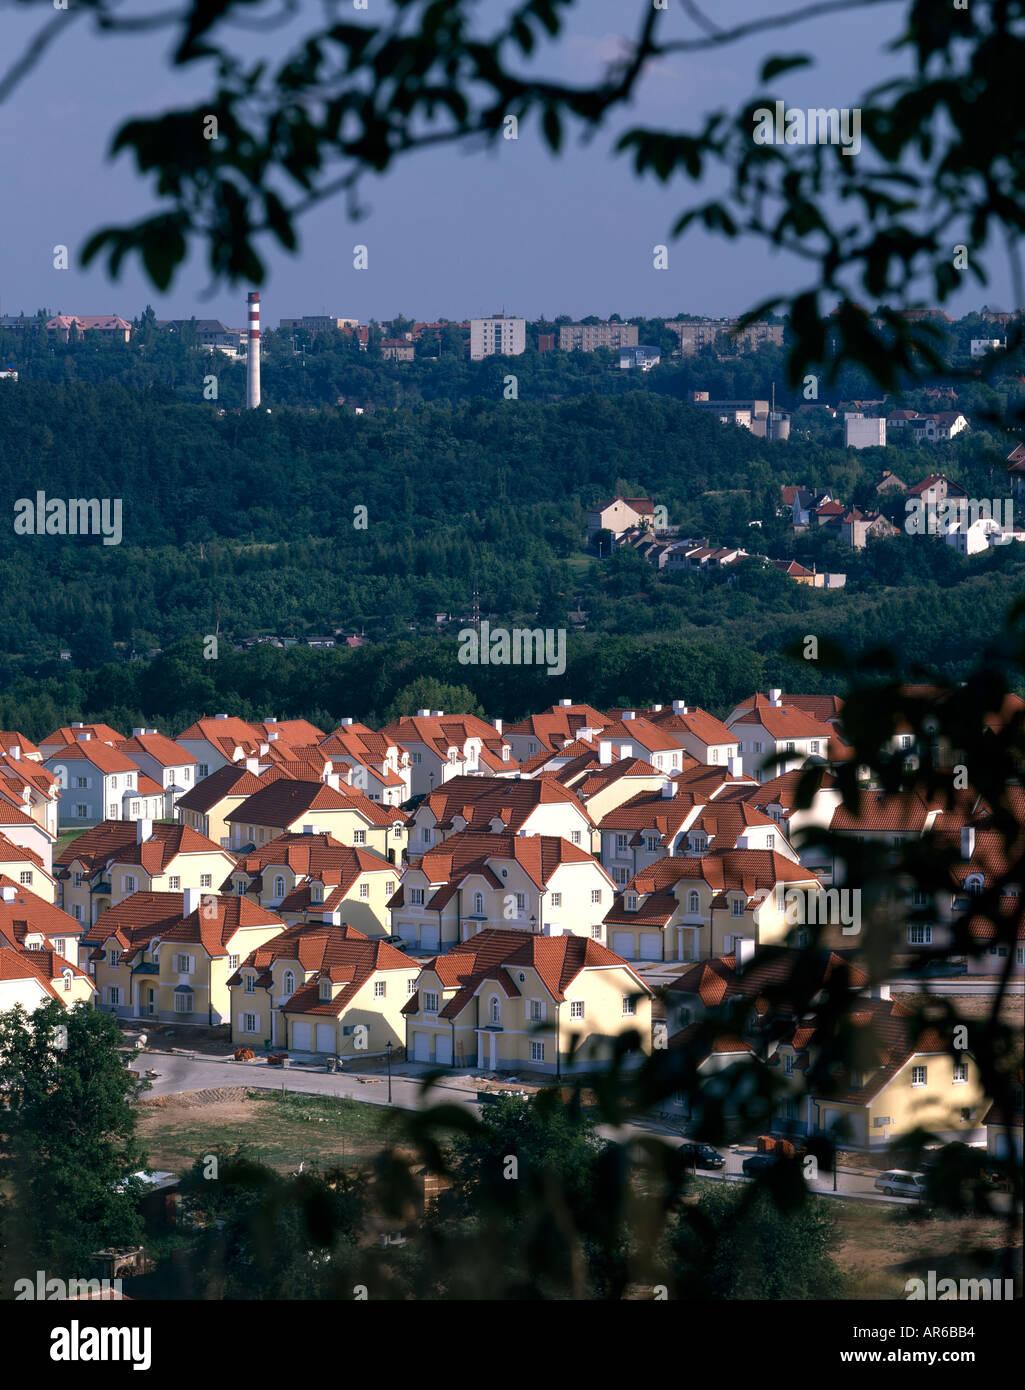 Sarka Mala, Logement Prague. Architecte: concept urbain Photo Stock